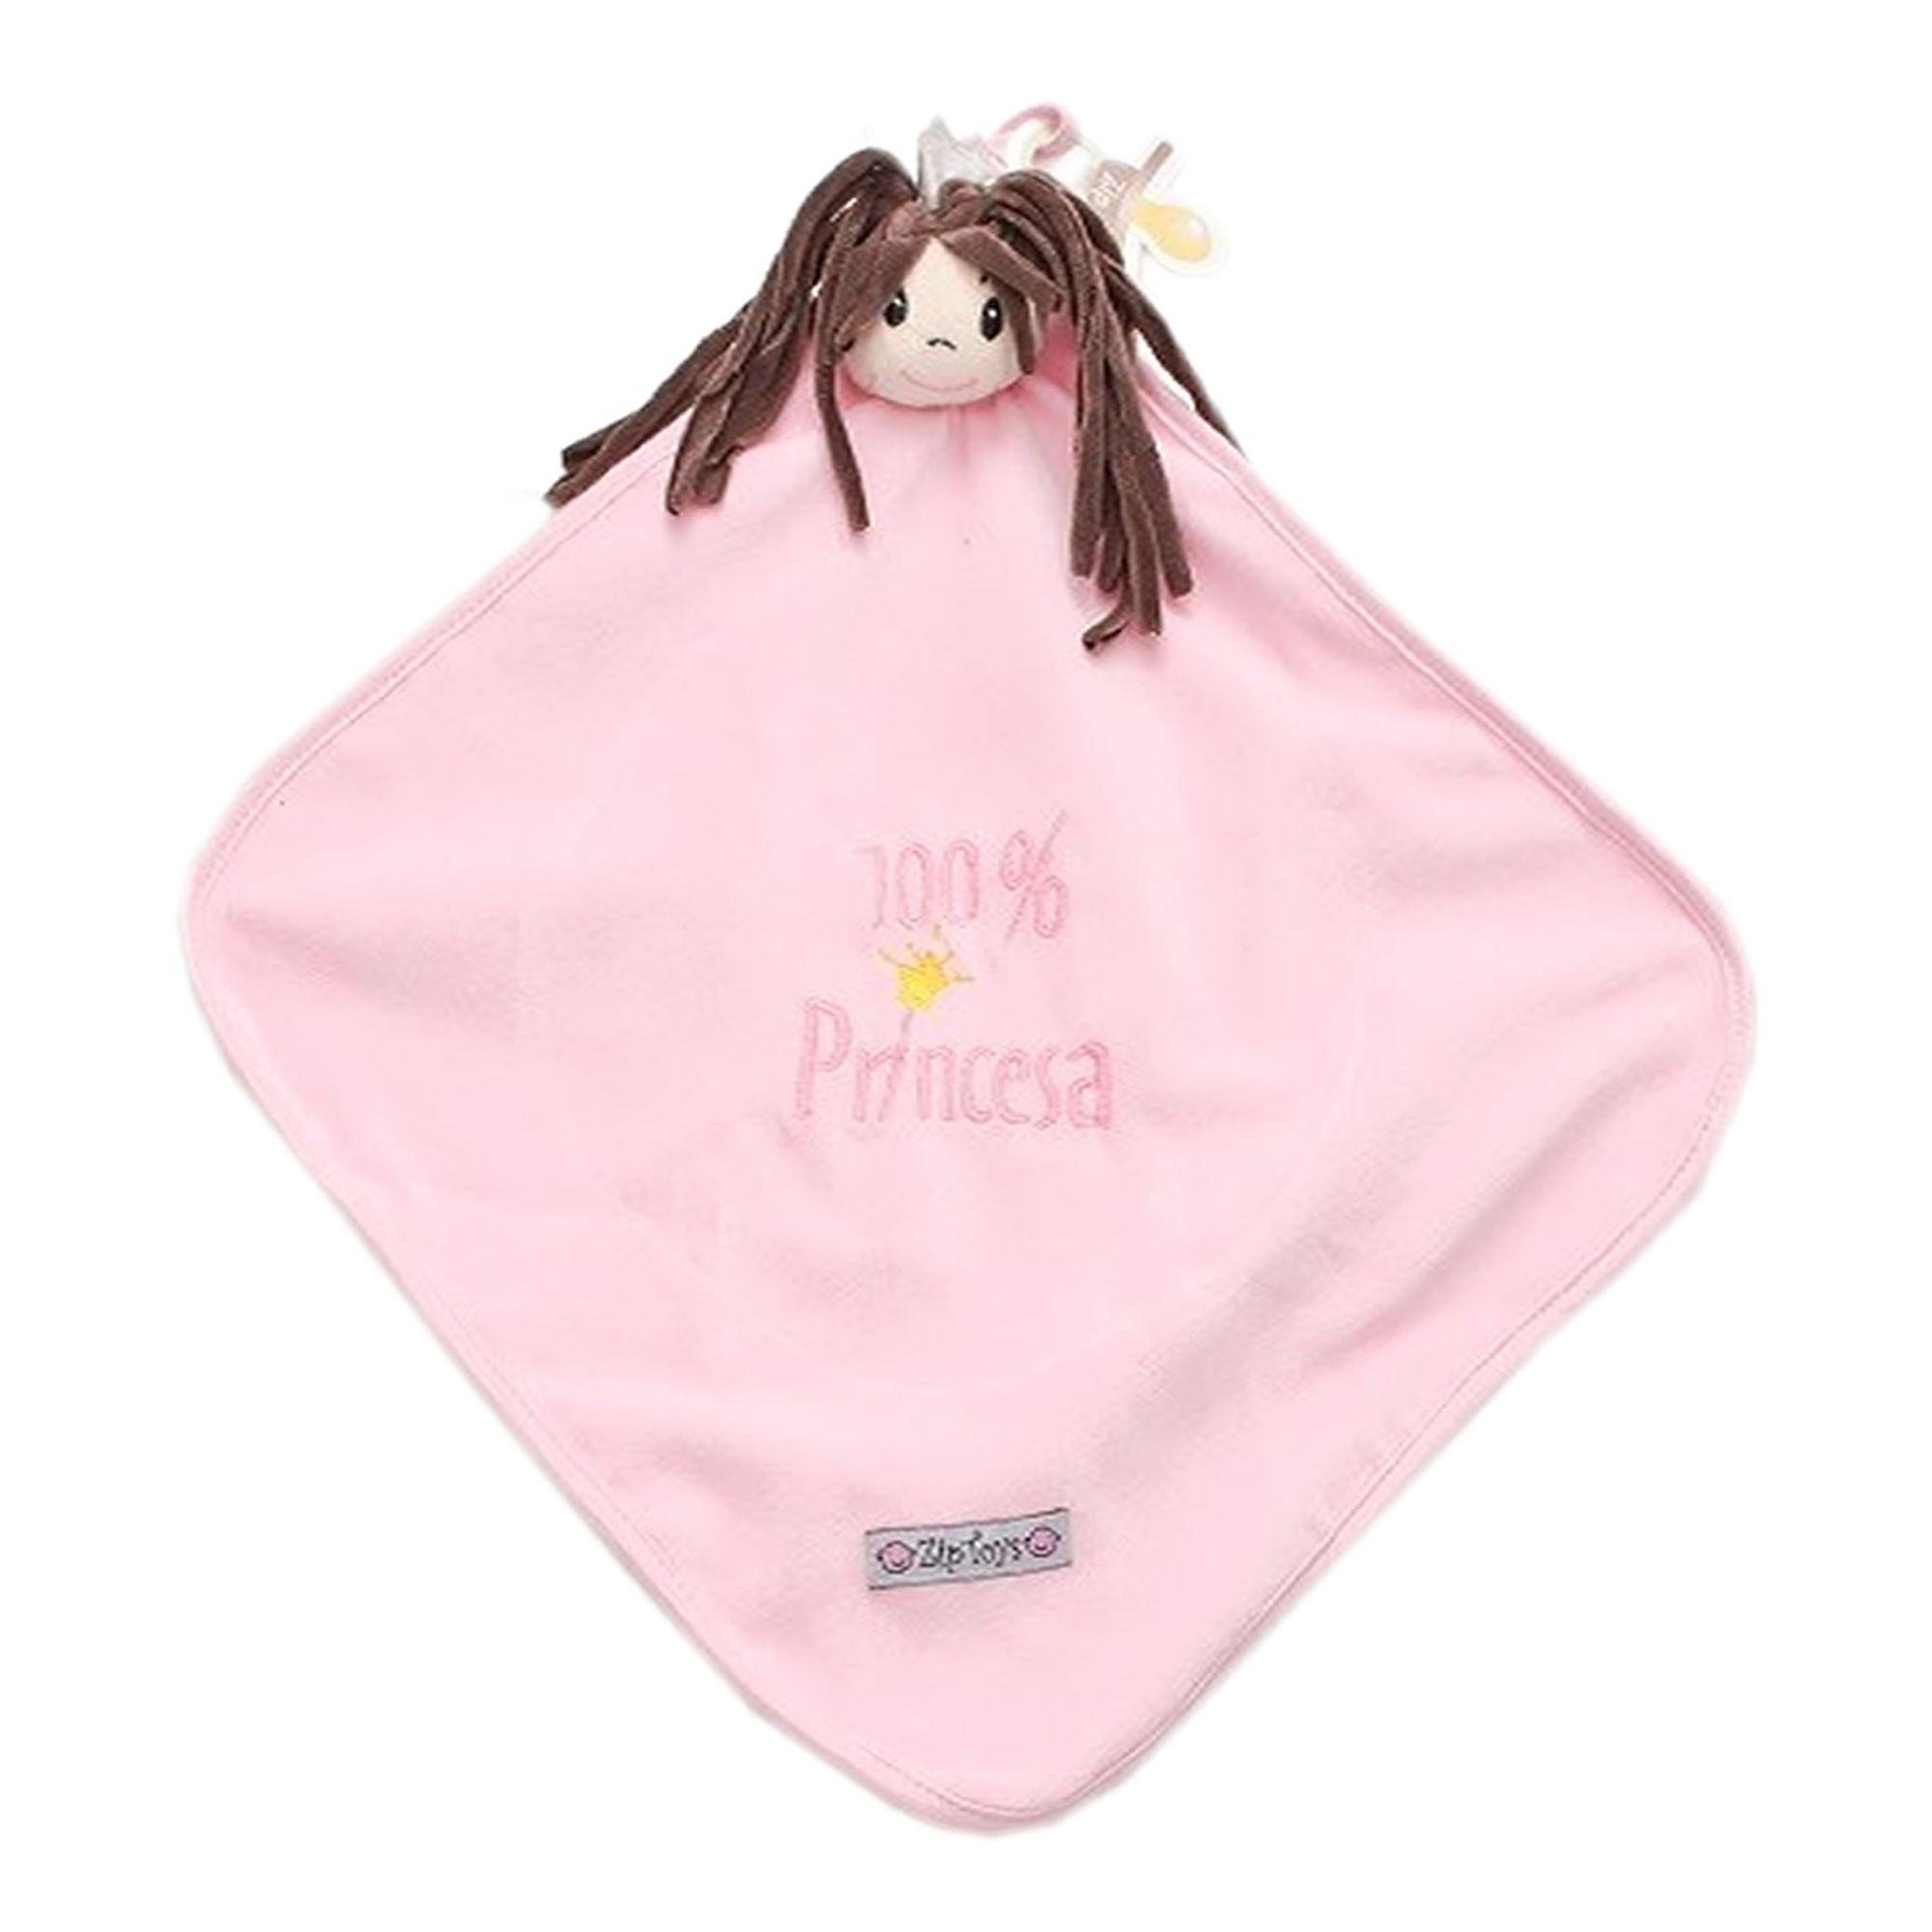 blanket-naninha-cetim-princesa-sophia-rosa-ziptoys